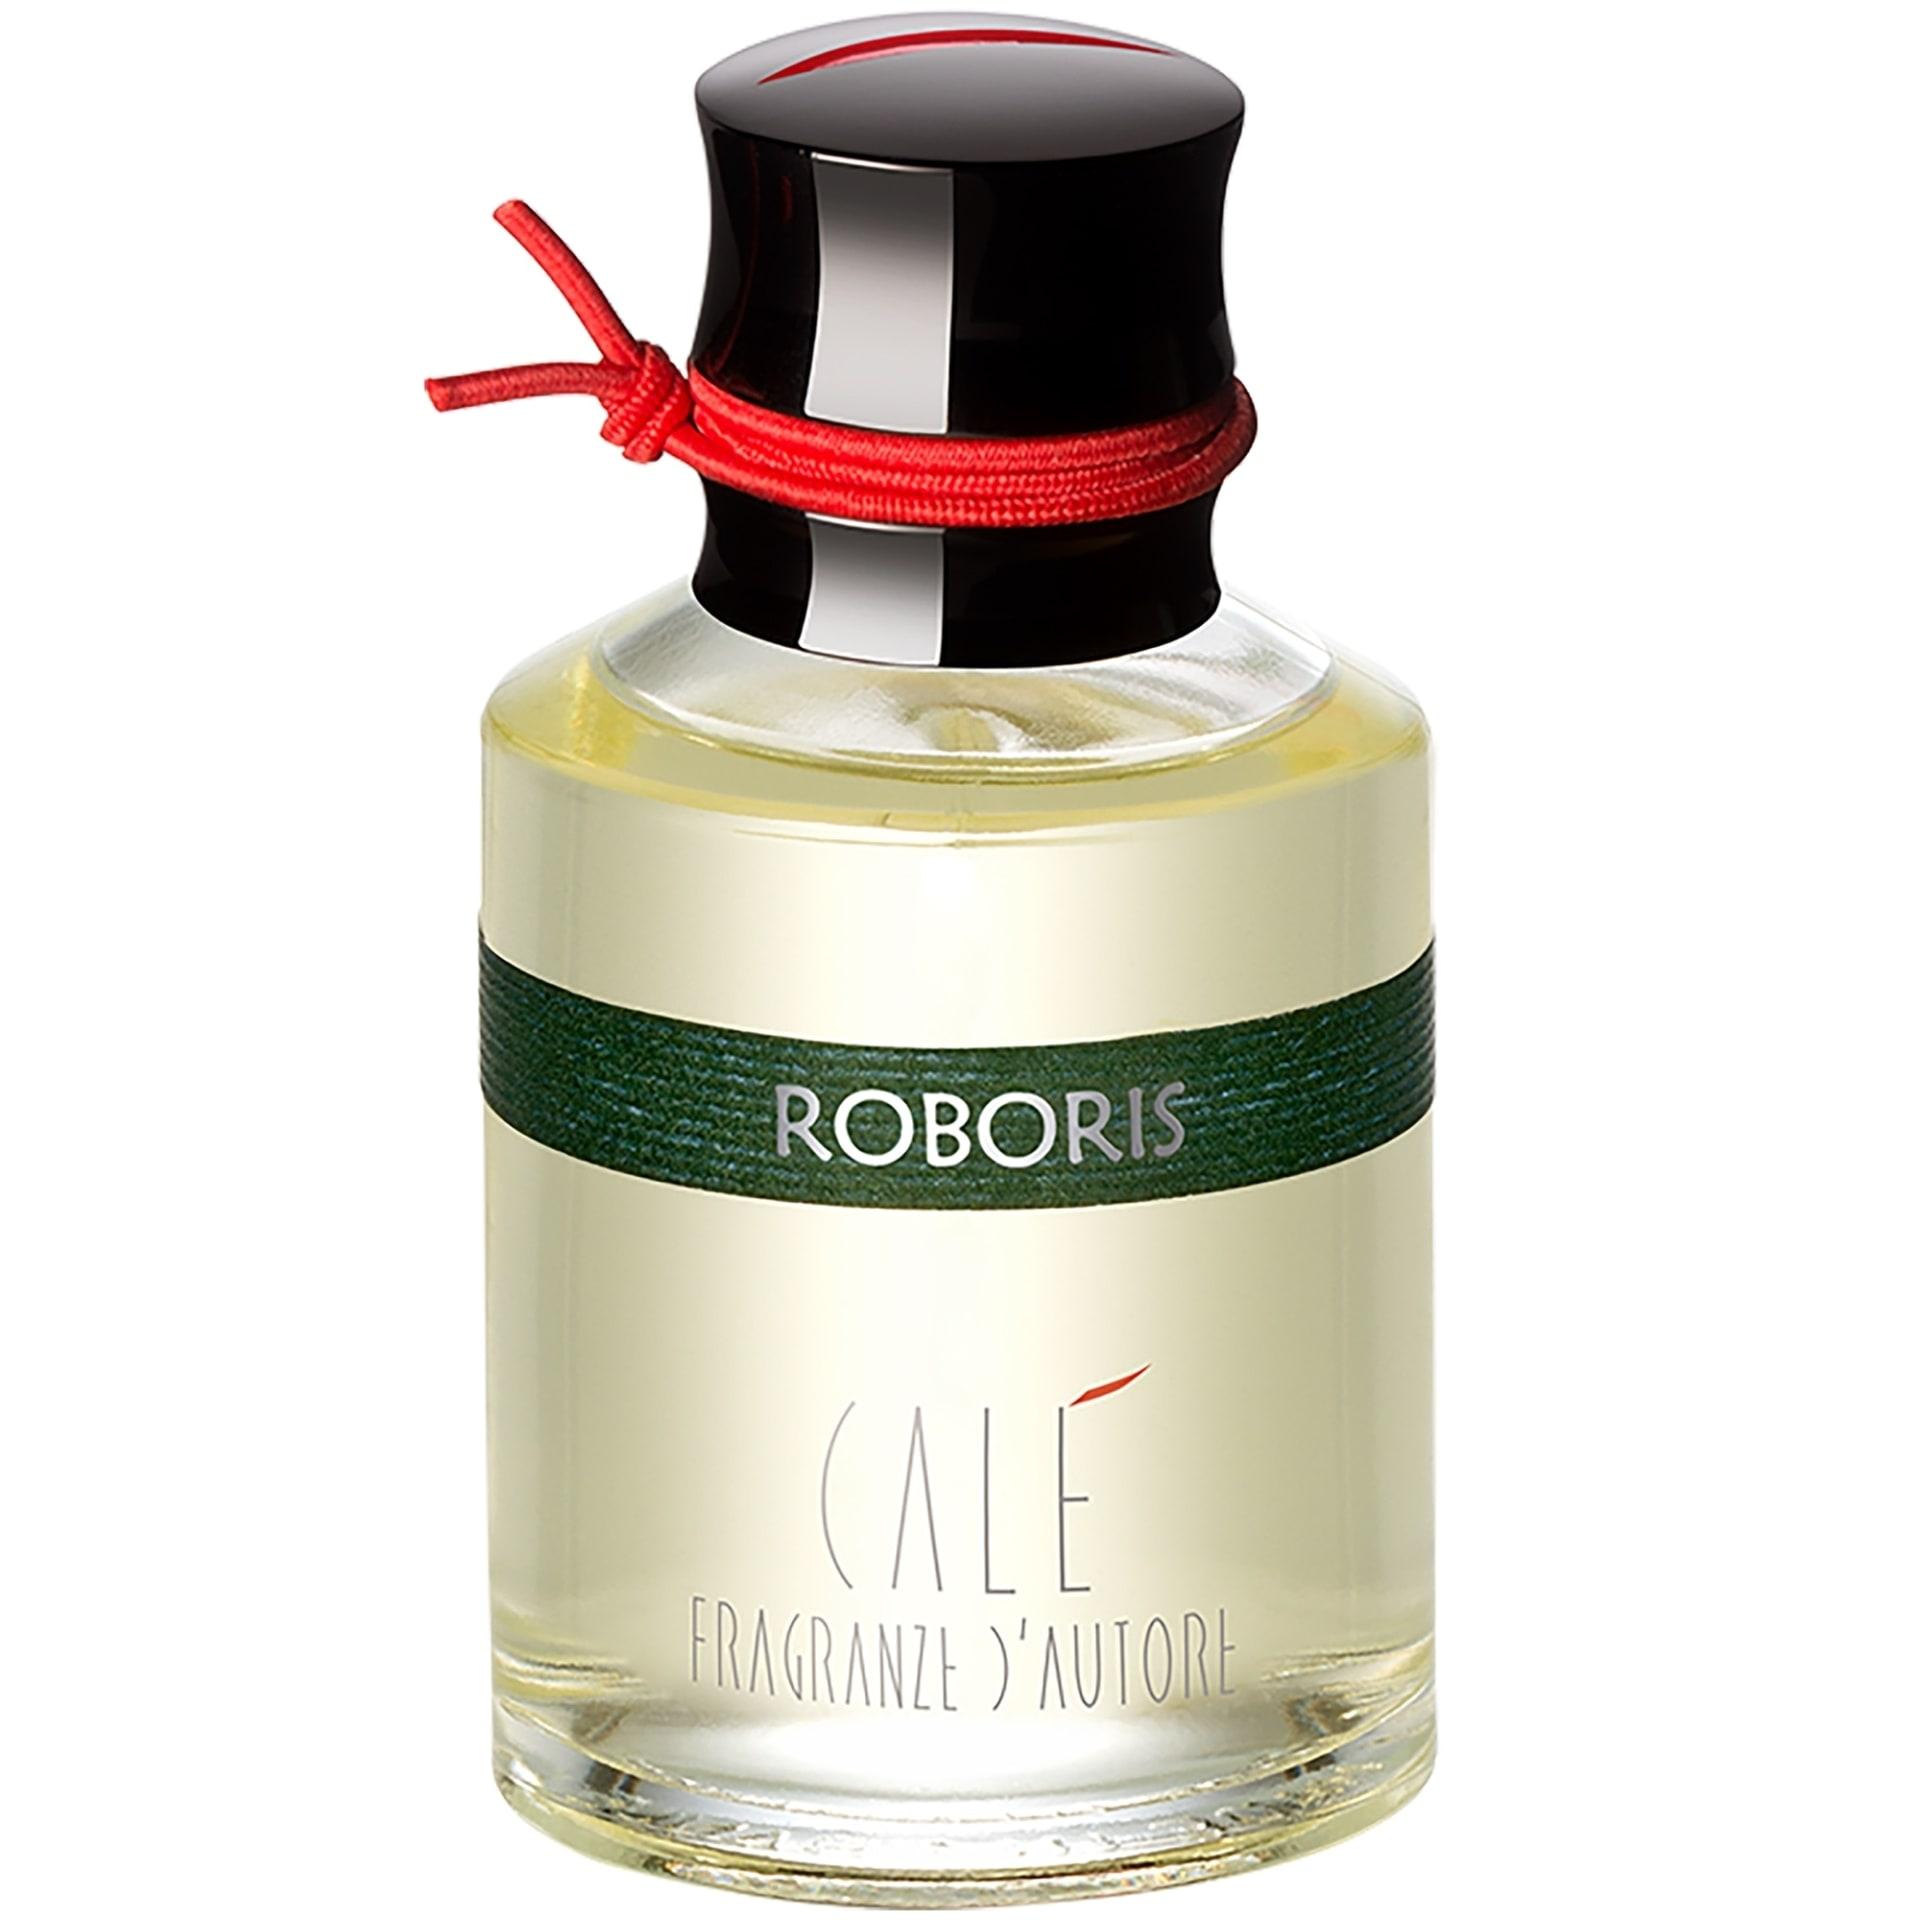 cale-fragranze-dautore-roboris